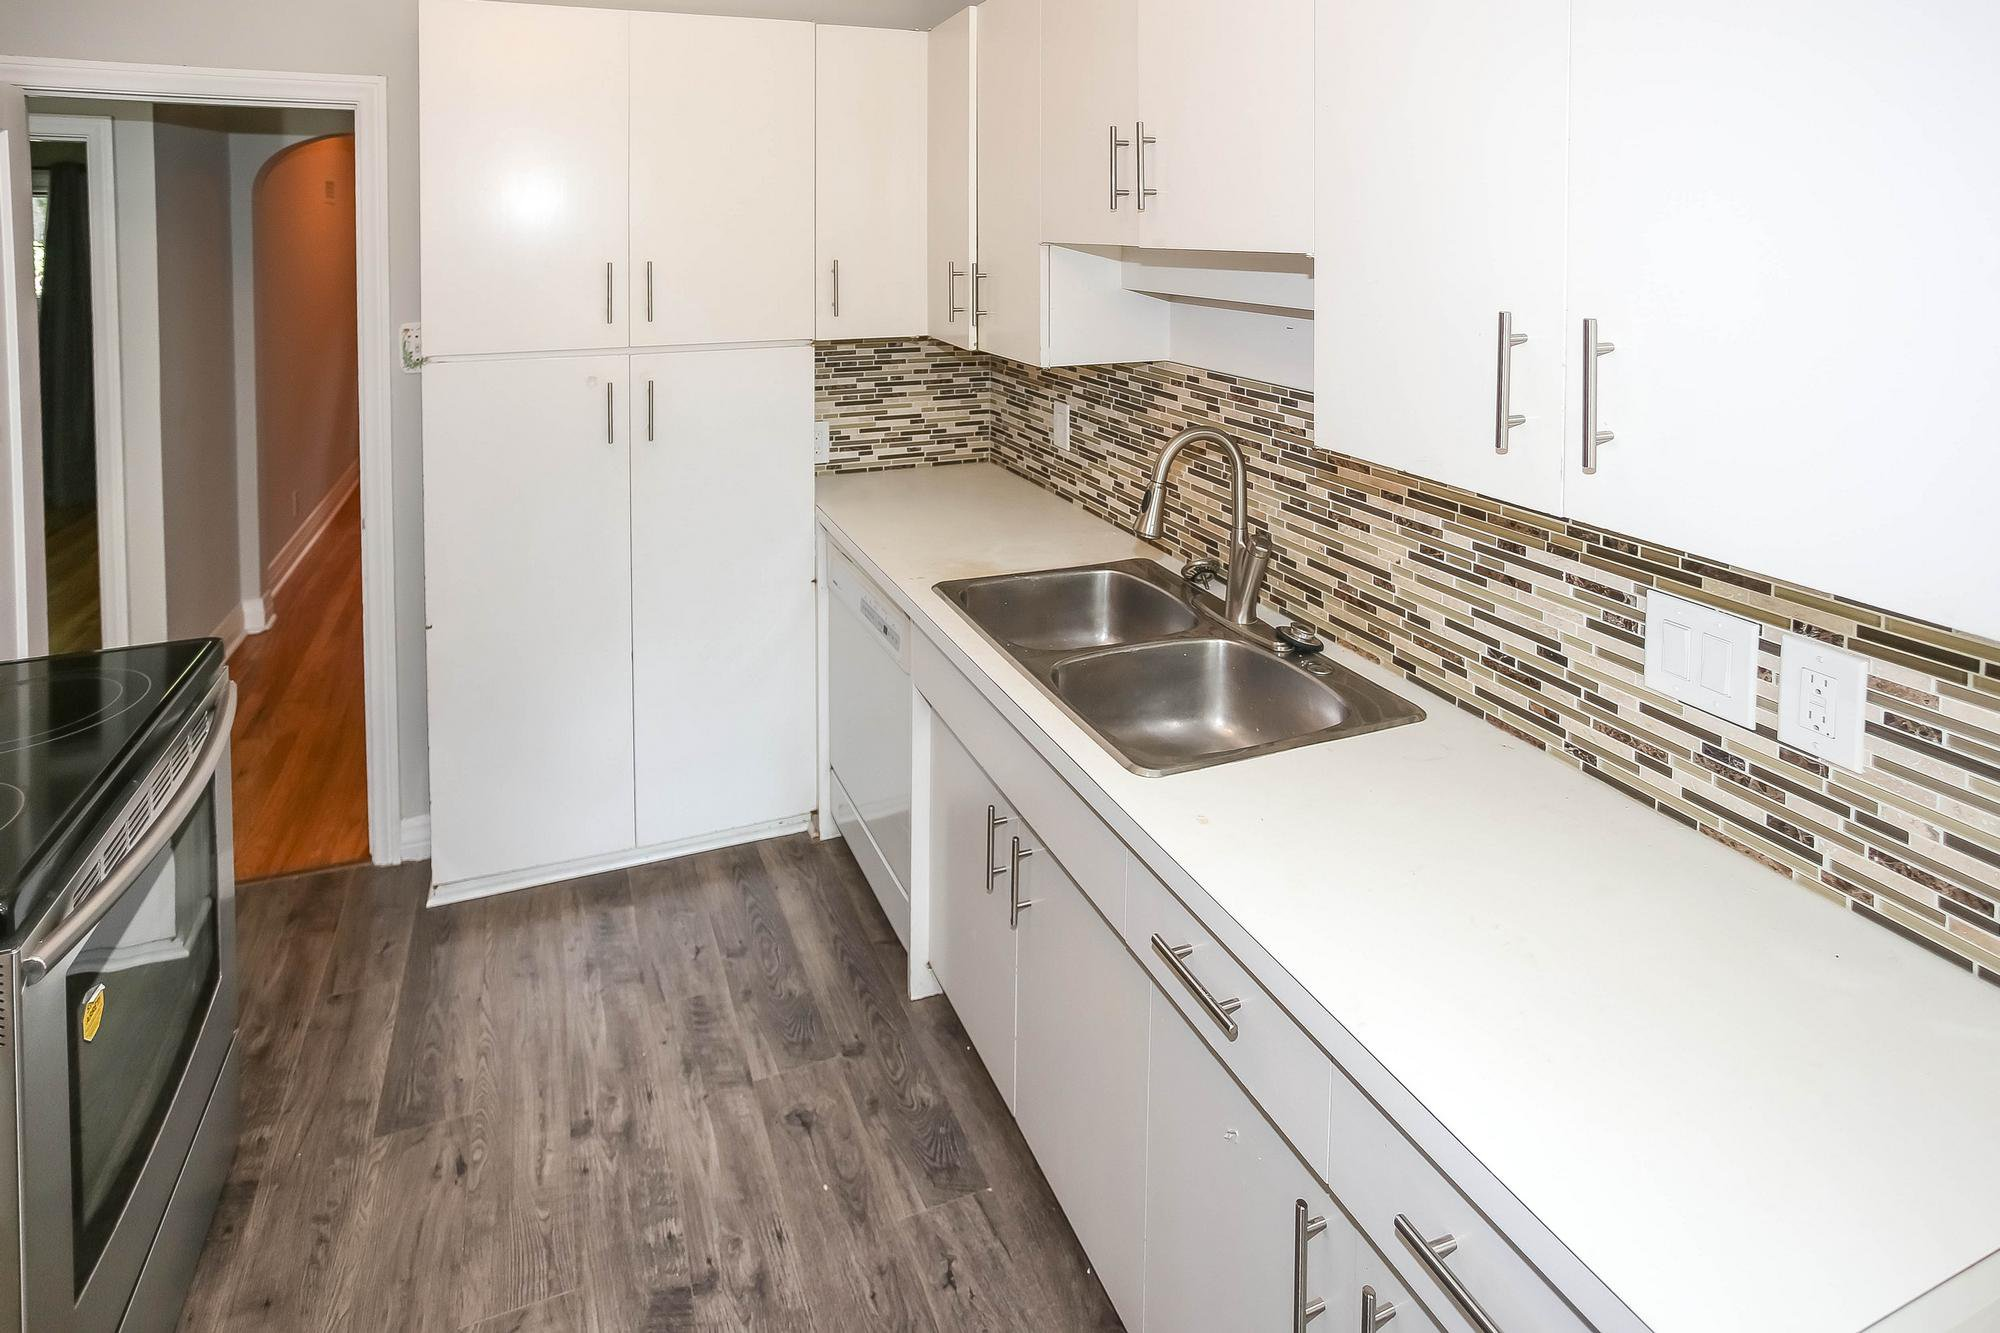 Photo 11: Photos: 155 Borebank Street in Winnipeg: River Heights Single Family Detached for sale (1C)  : MLS®# 202017166